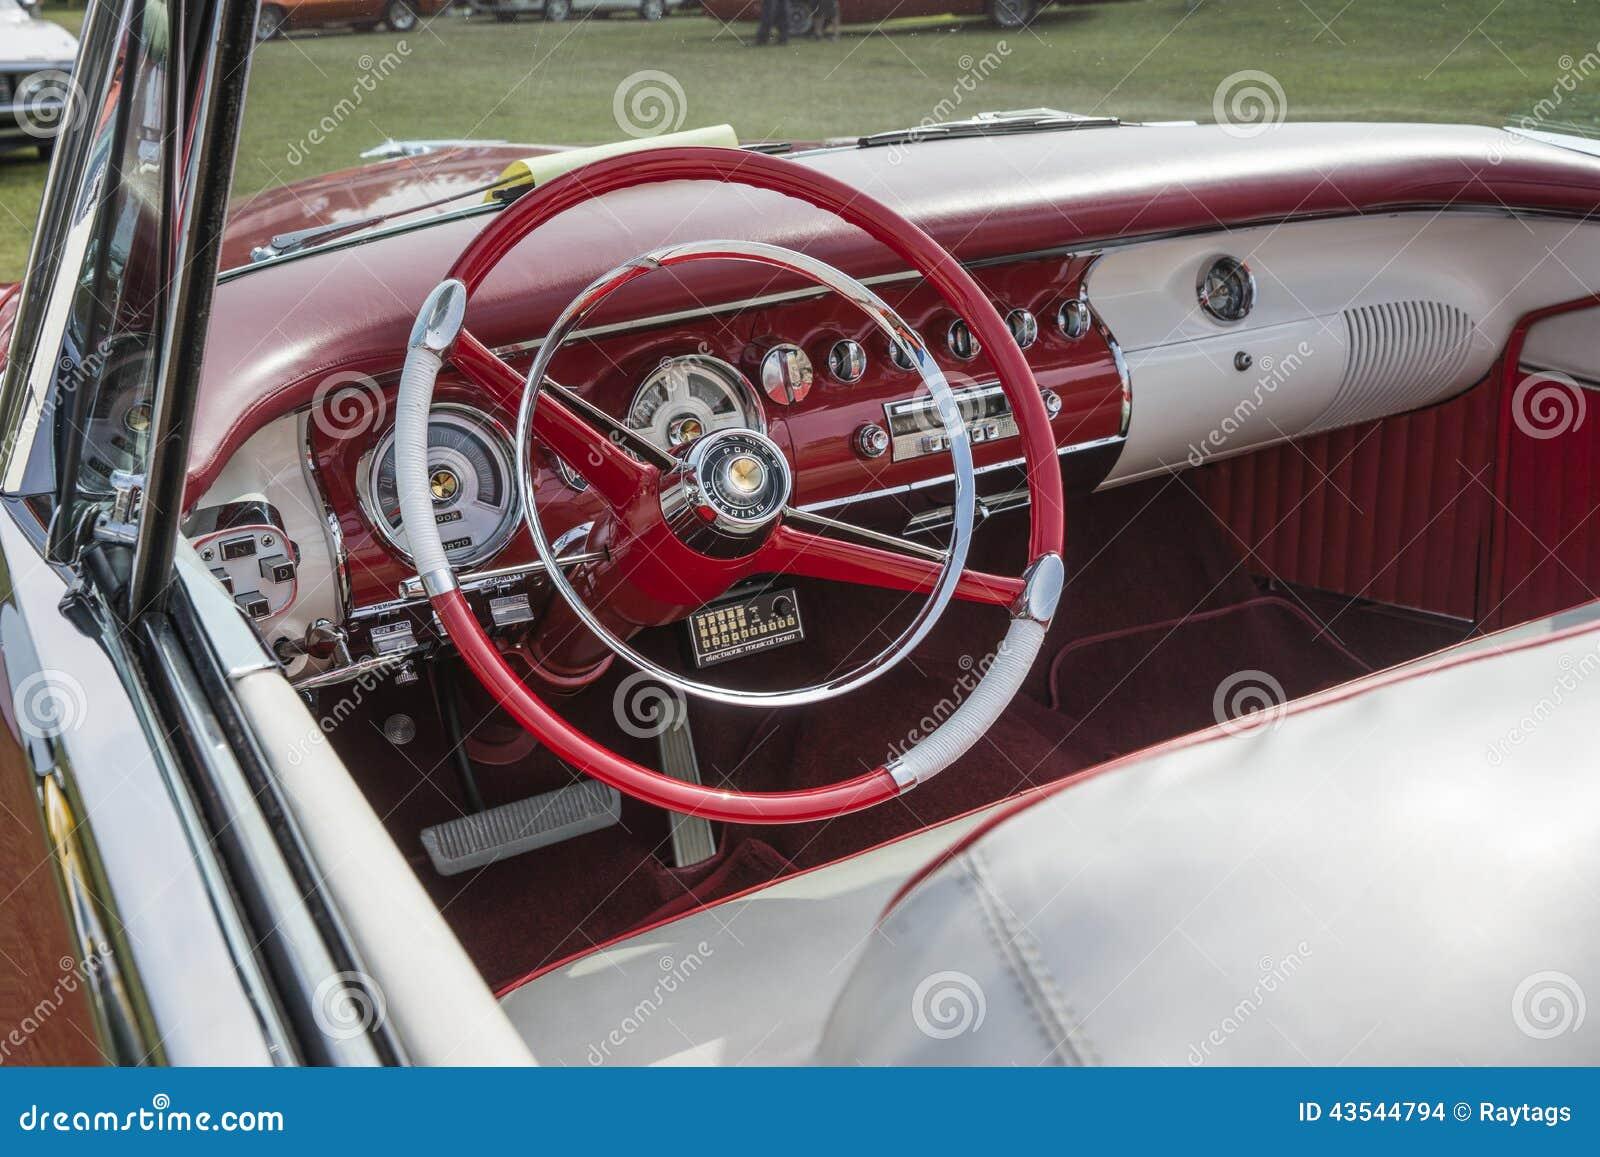 Chrysler dashboard stock photo. Image of vintage, driving - 43544794